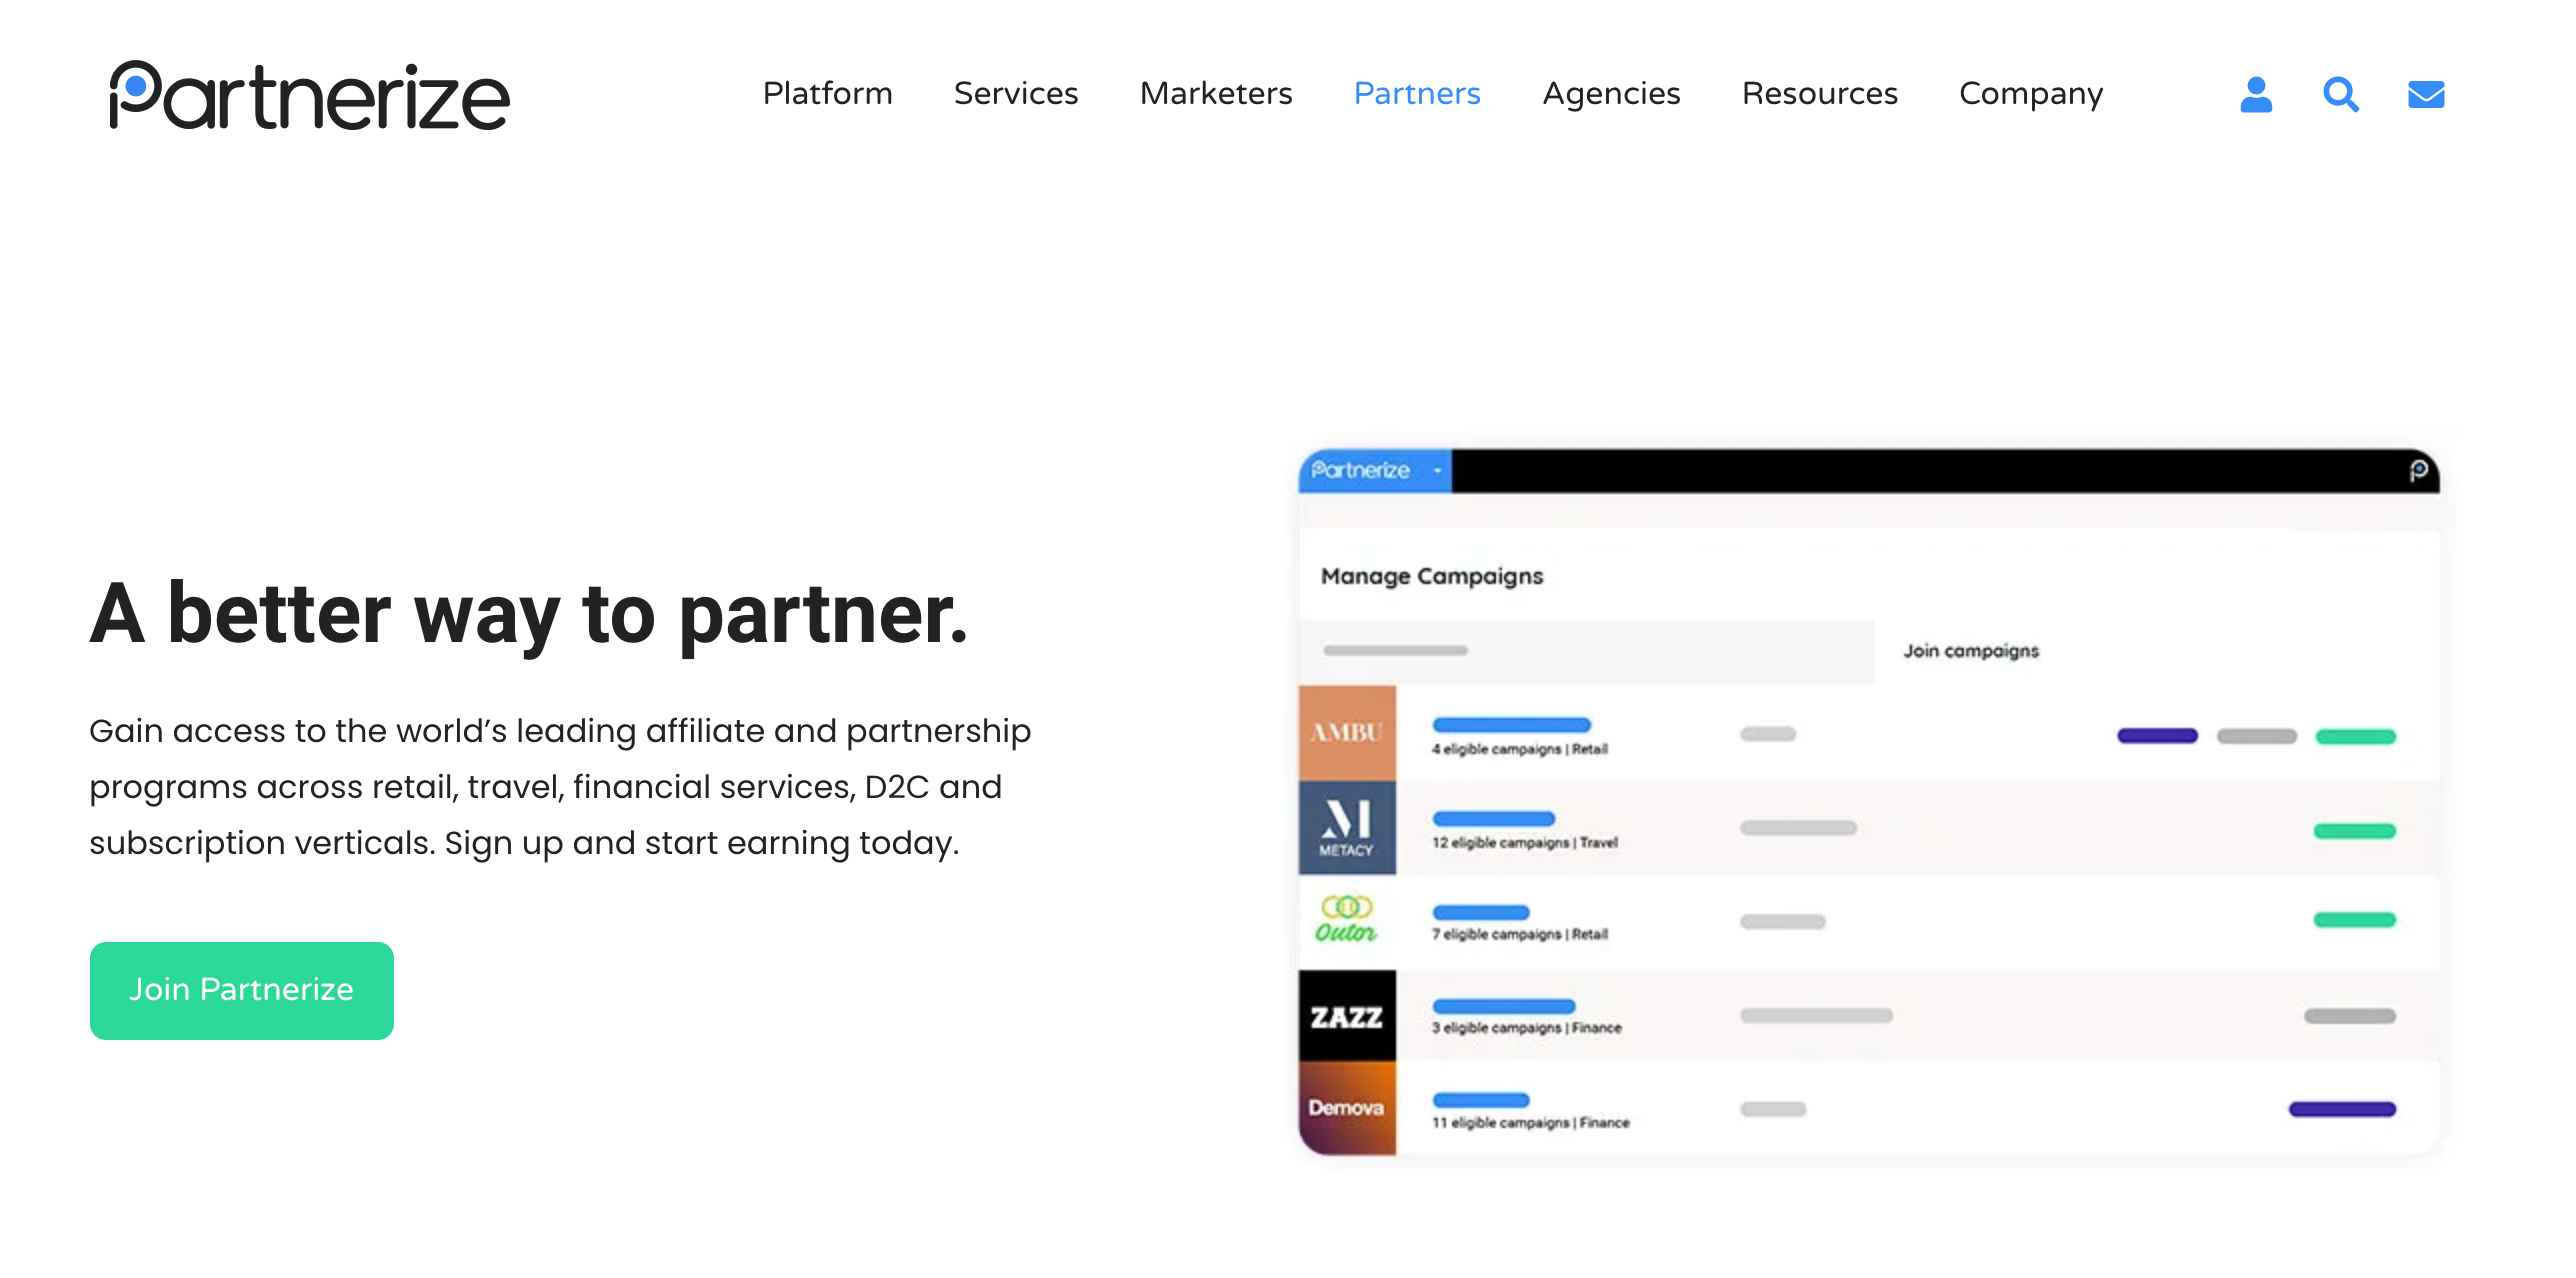 Marketing Software: Partnerize